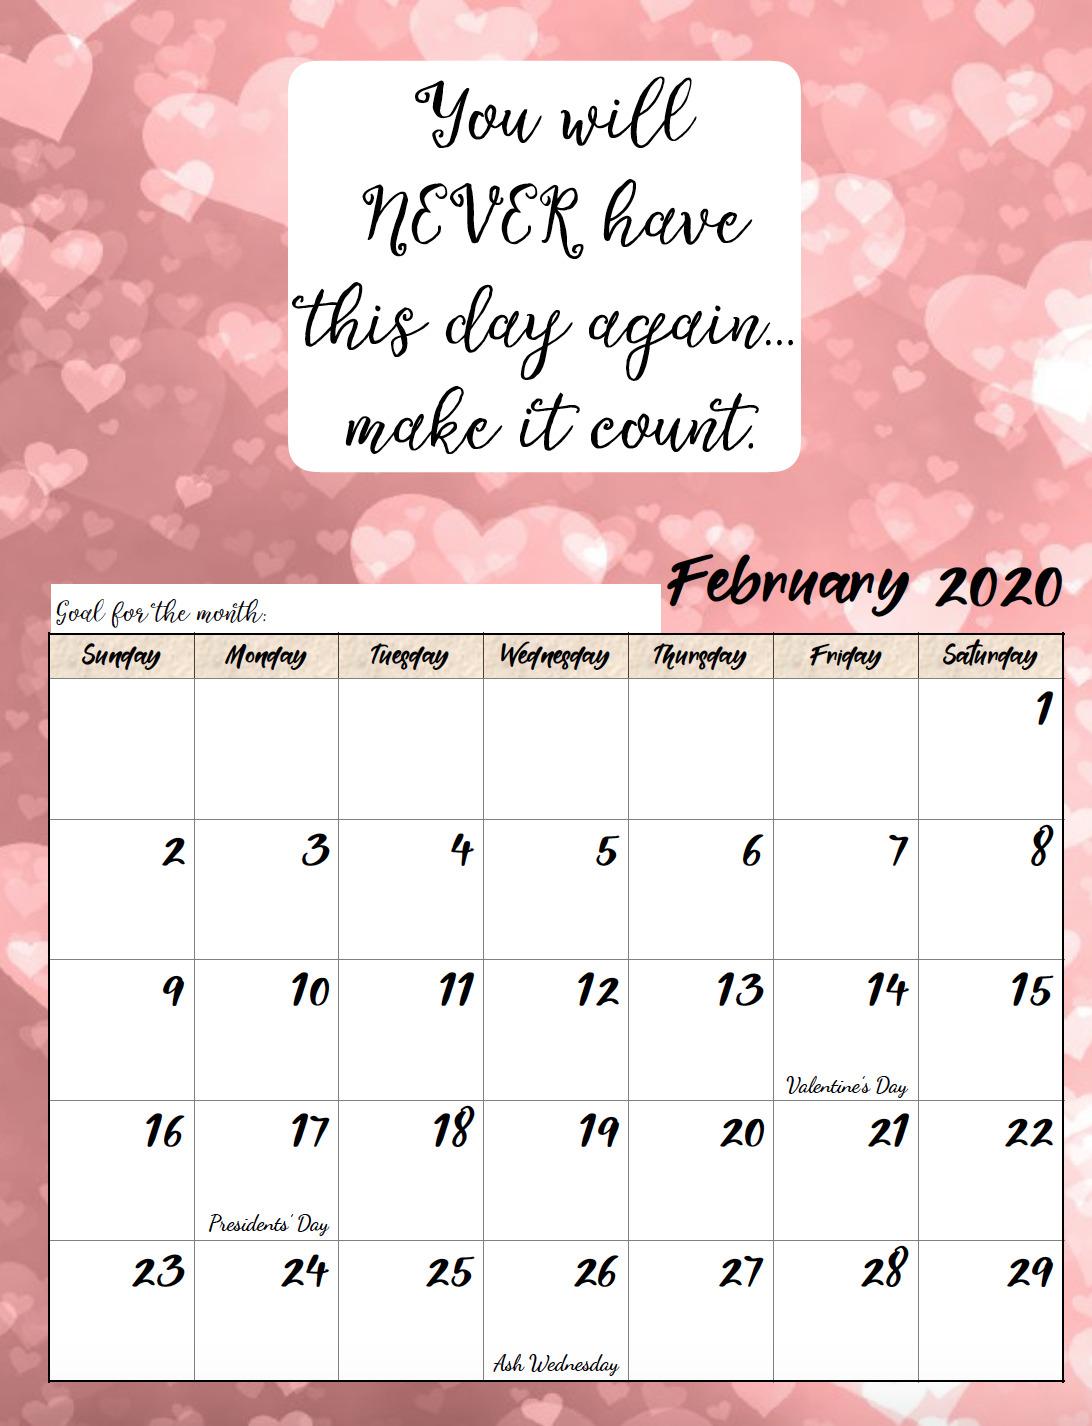 Free printable February 2020 monthly motivational calendar.